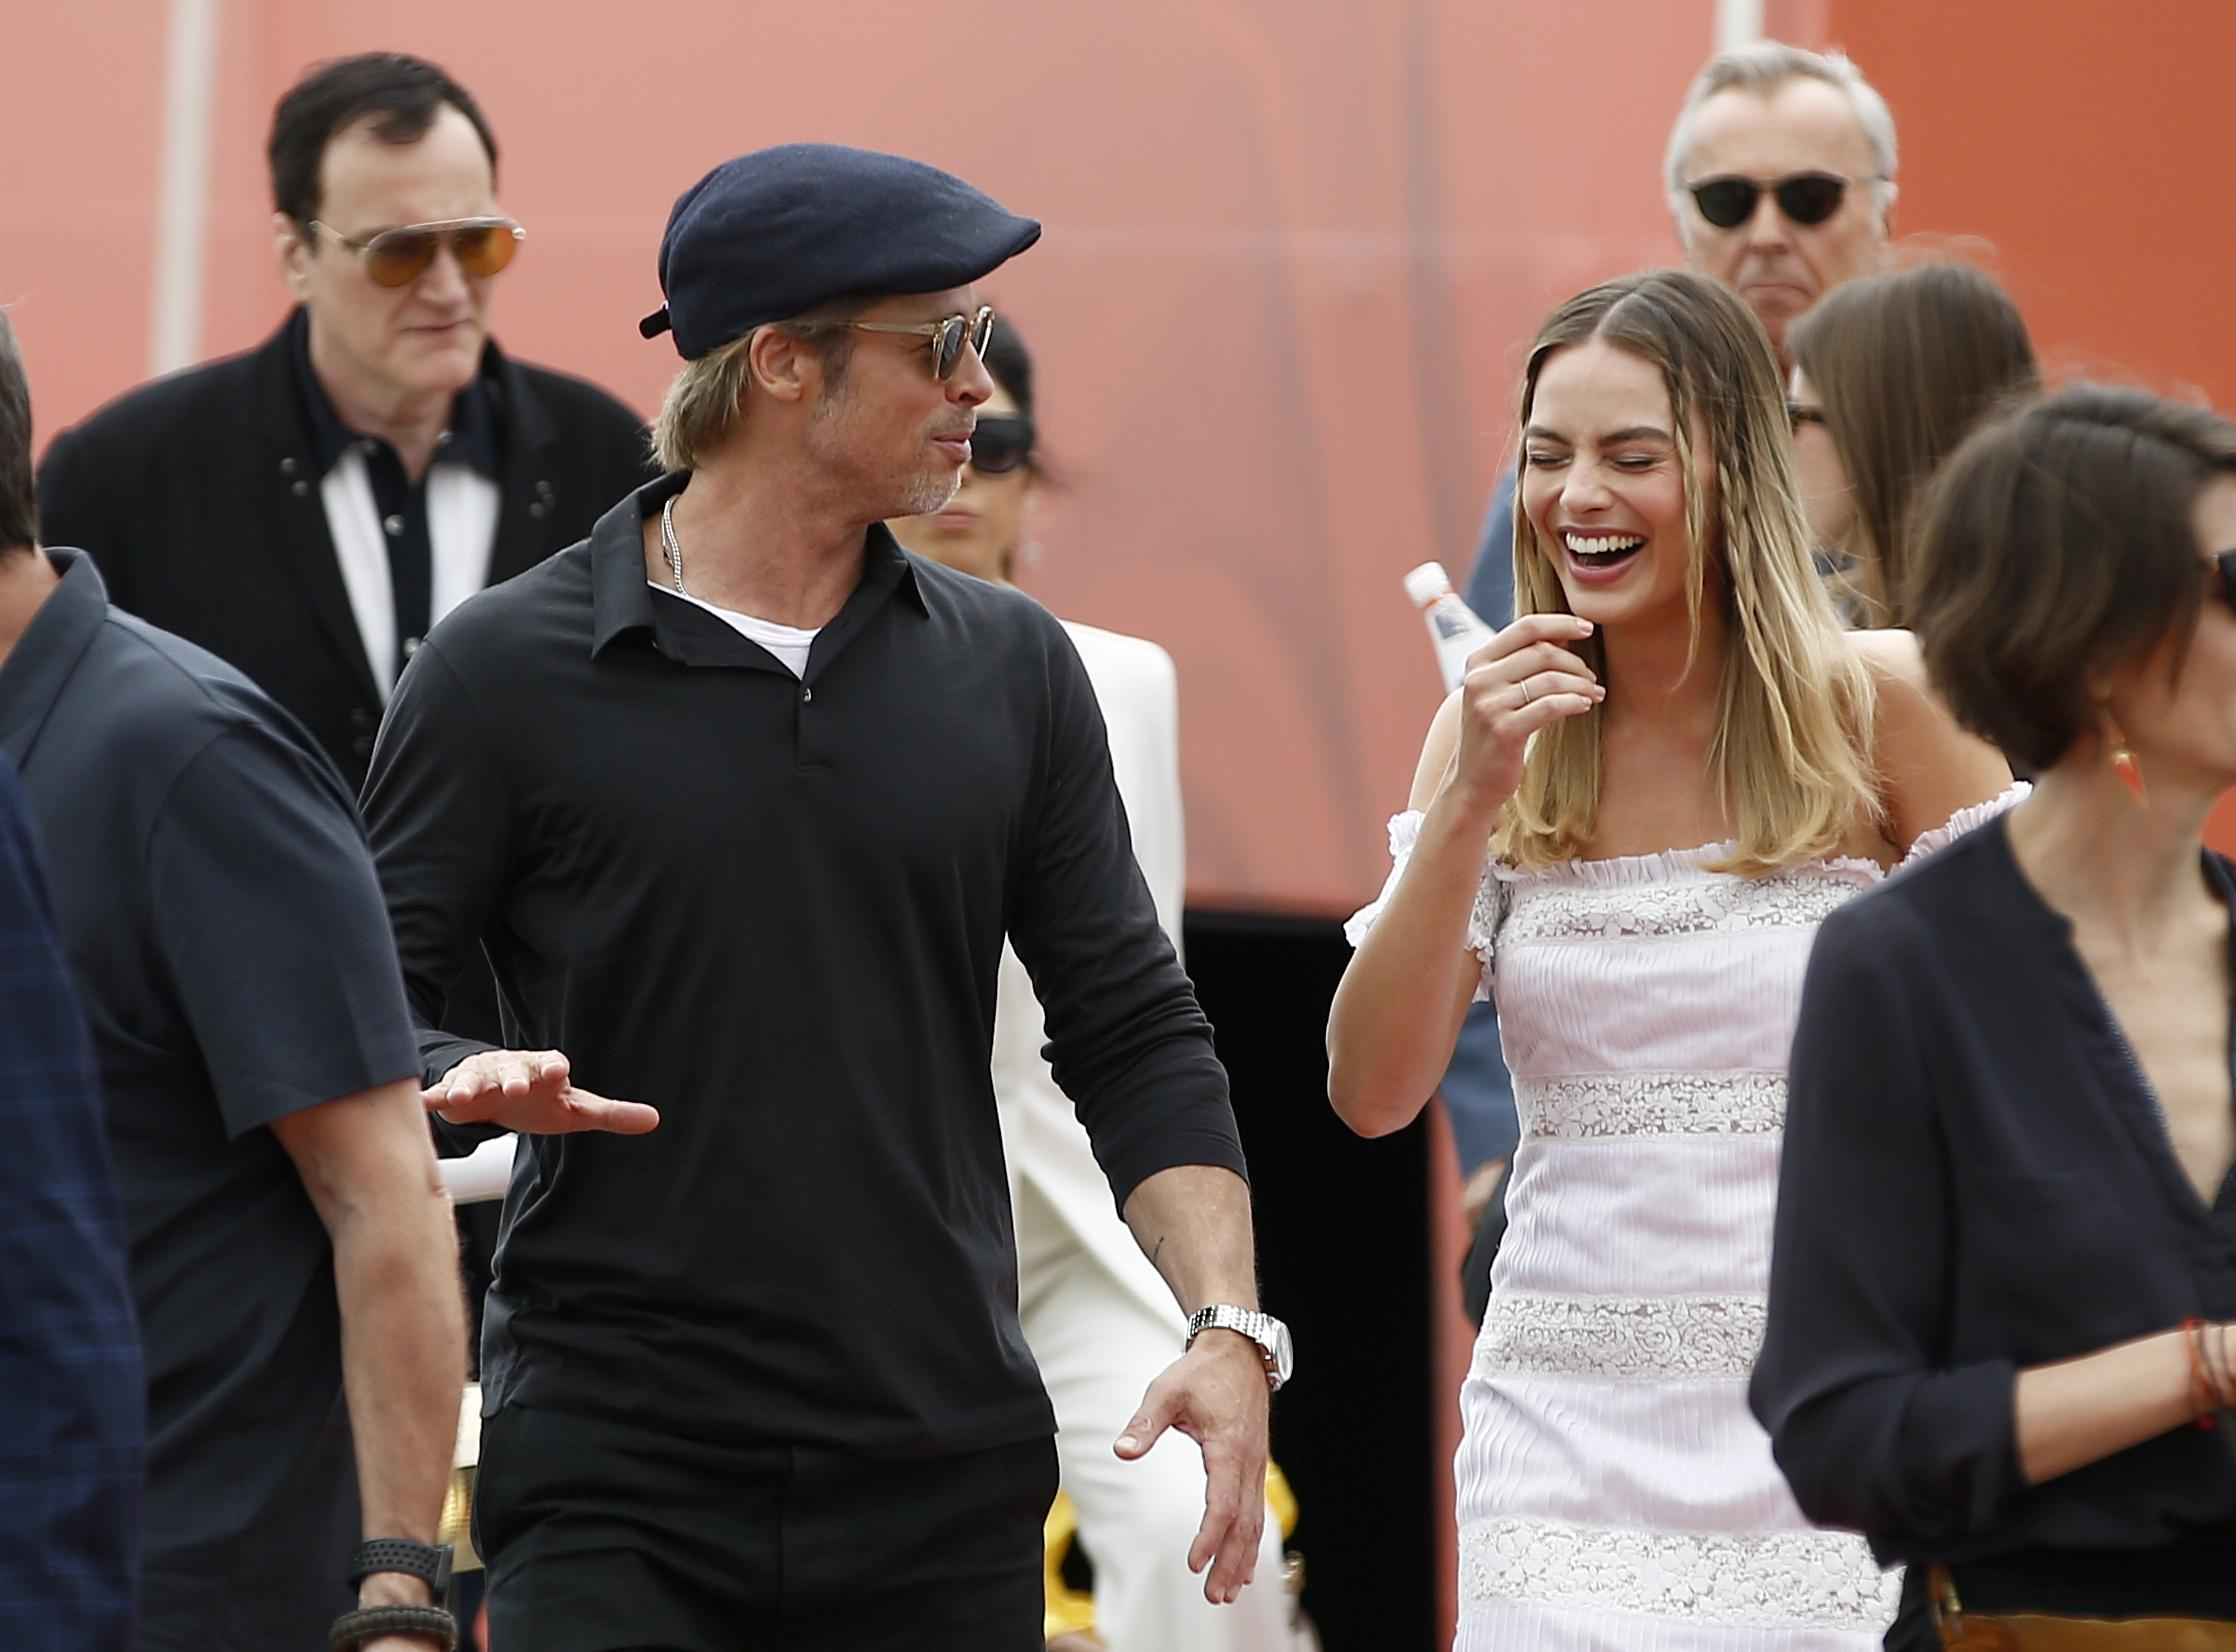 Tarantino did not tell Polanski about film set against